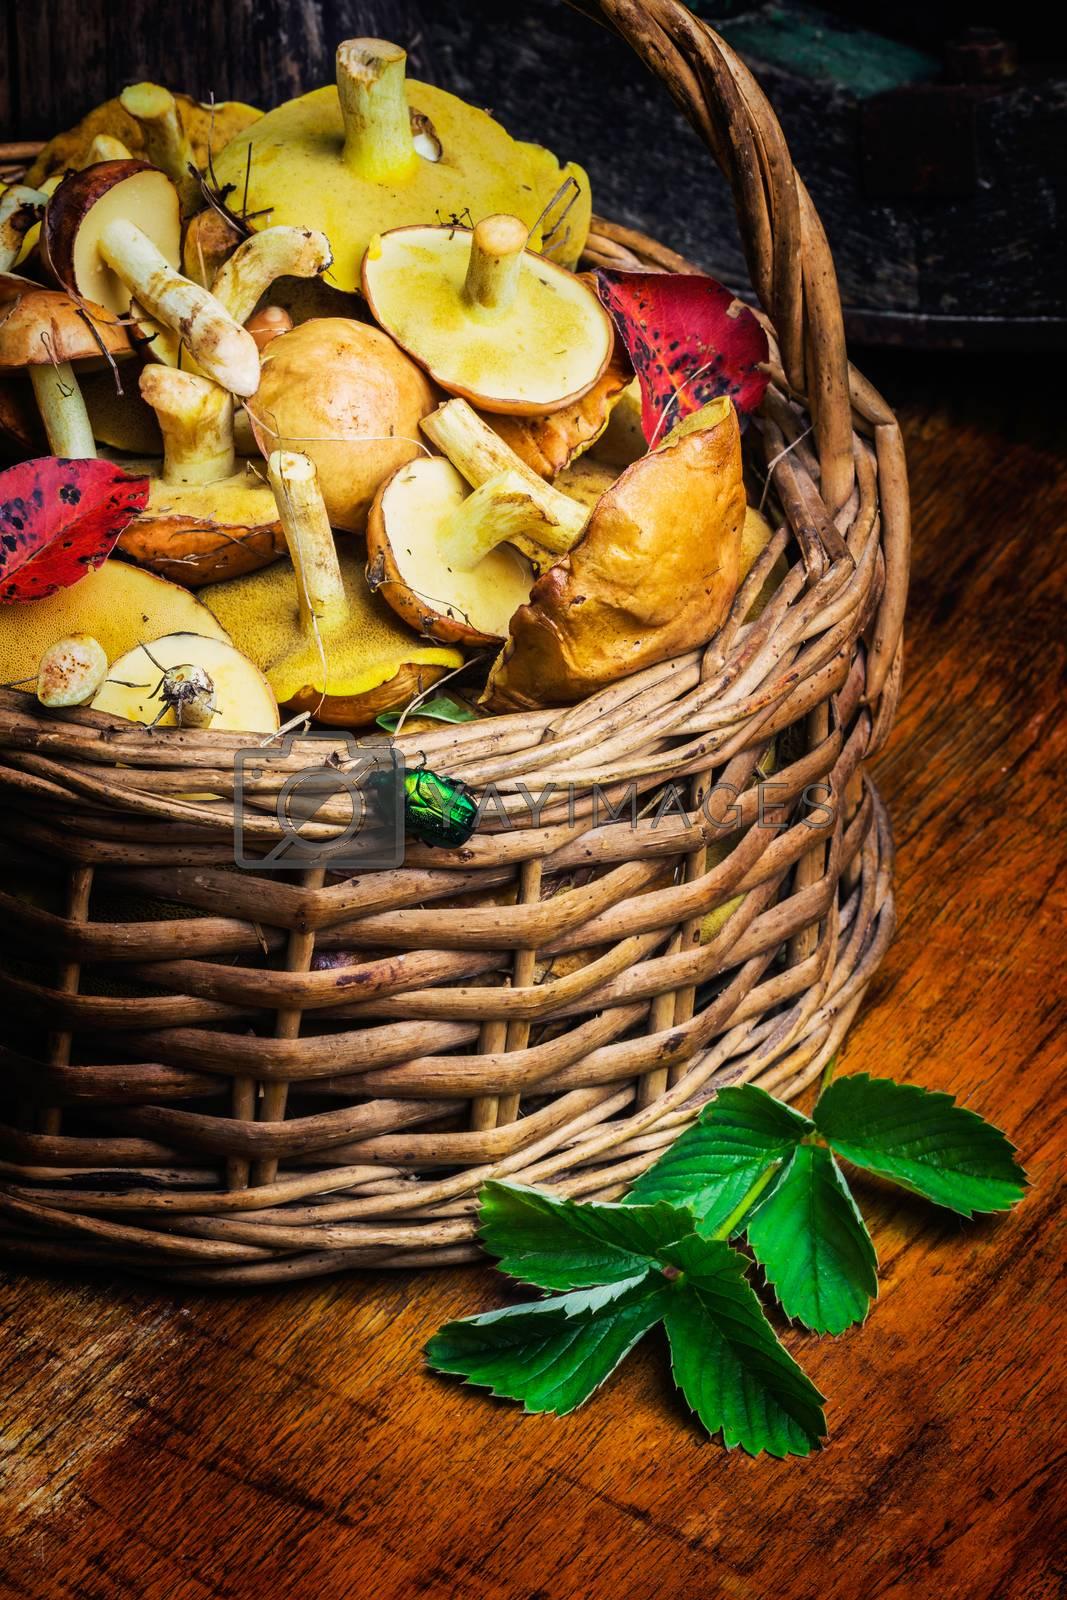 Still life of yellow boletus mushrooms in a basket